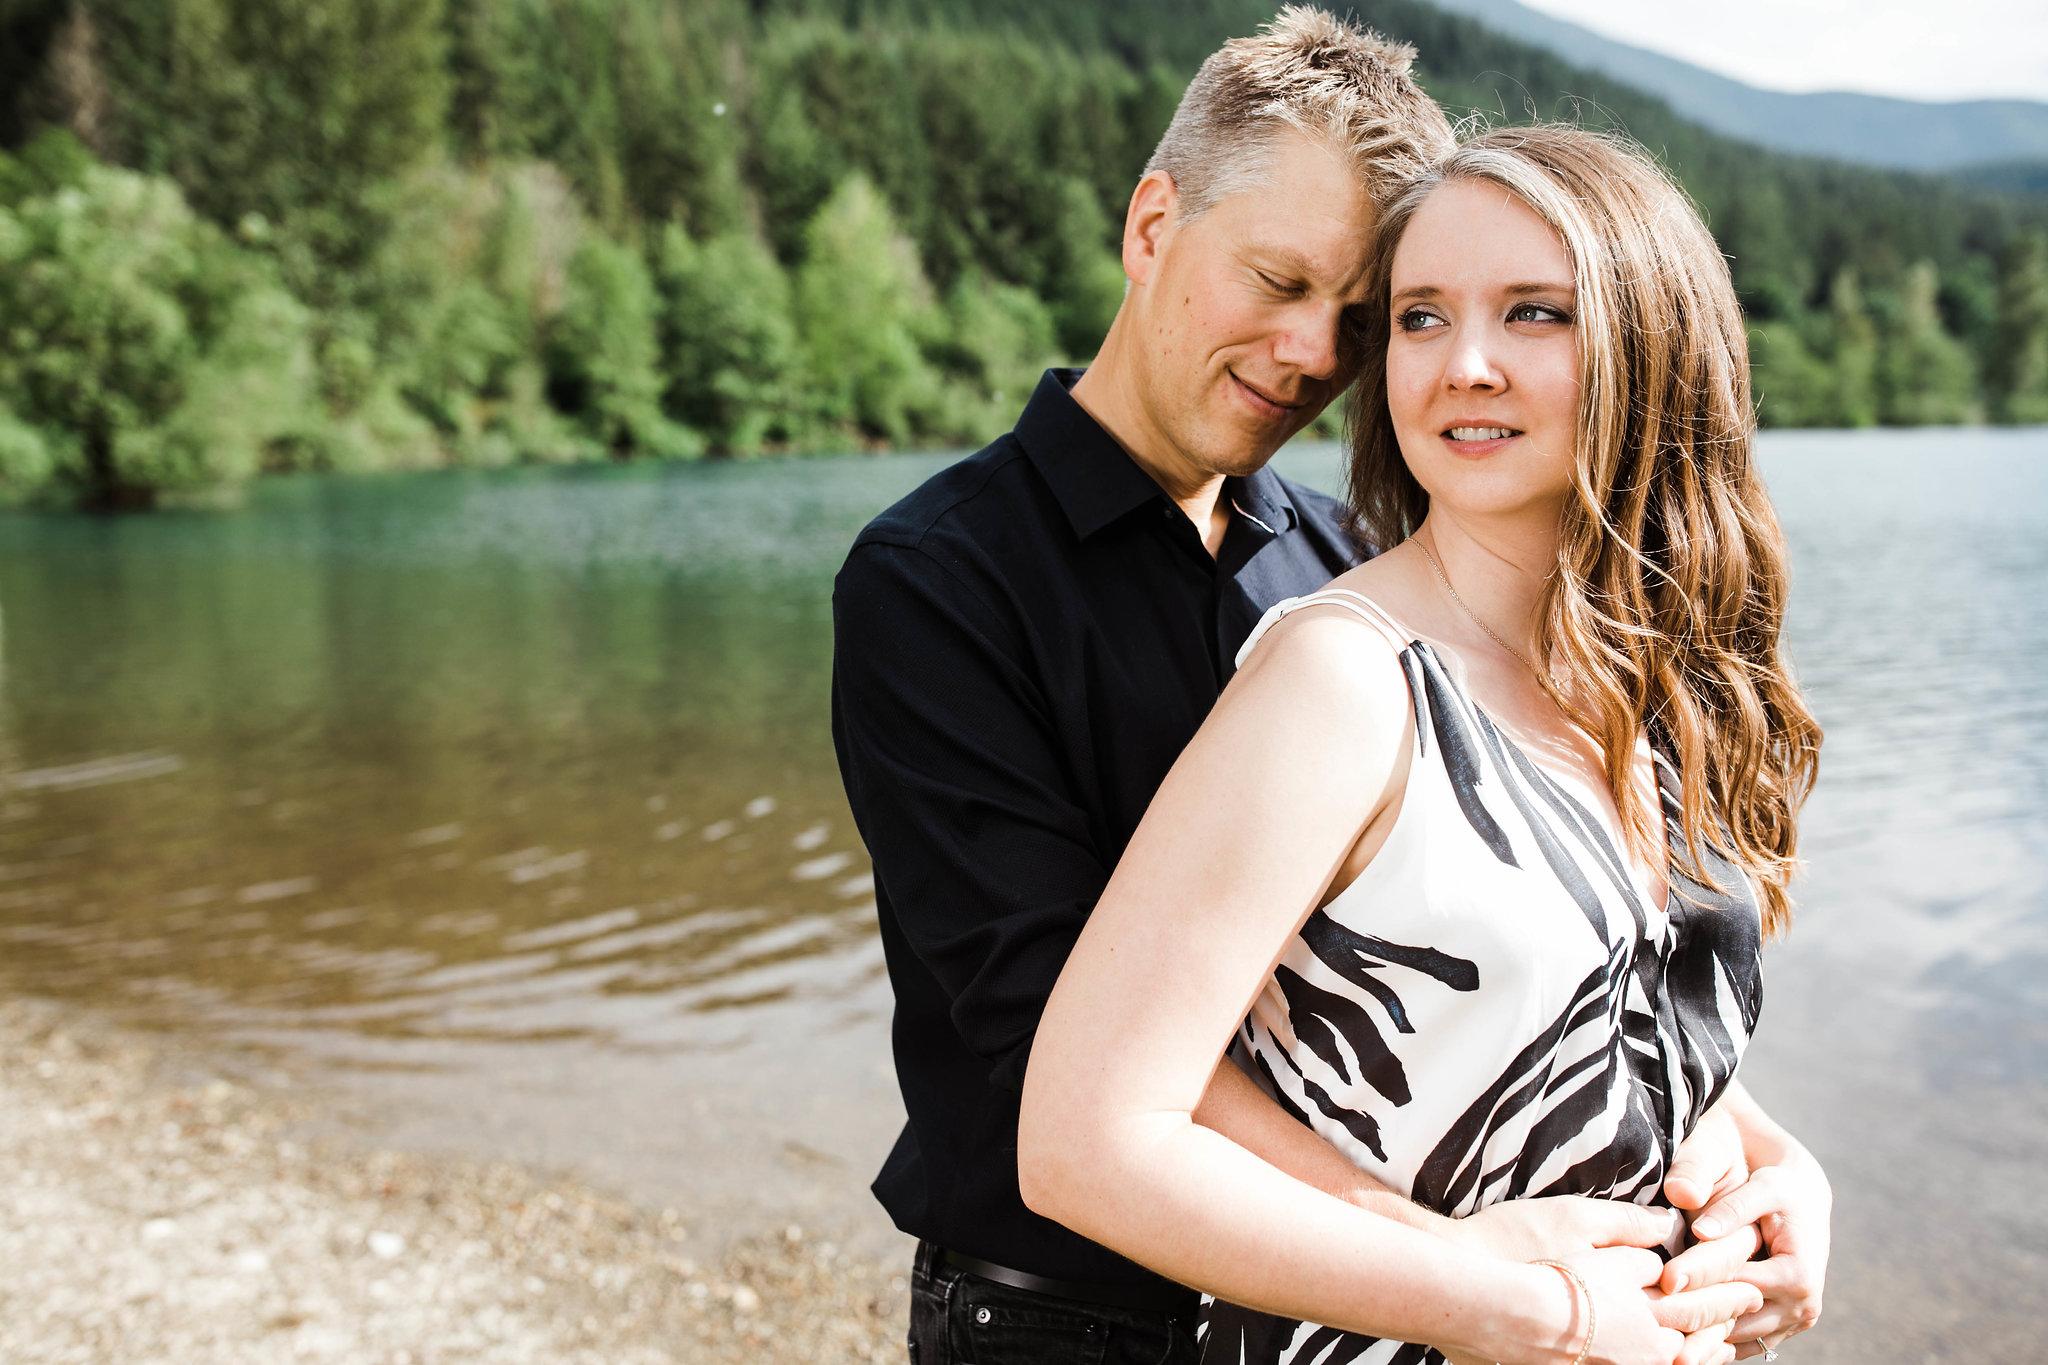 Eivind+Elyse_Engagement_Rattlesnake_lake_ridge_Seattle_Photographer_Adina_Preston_Weddings_33.JPG